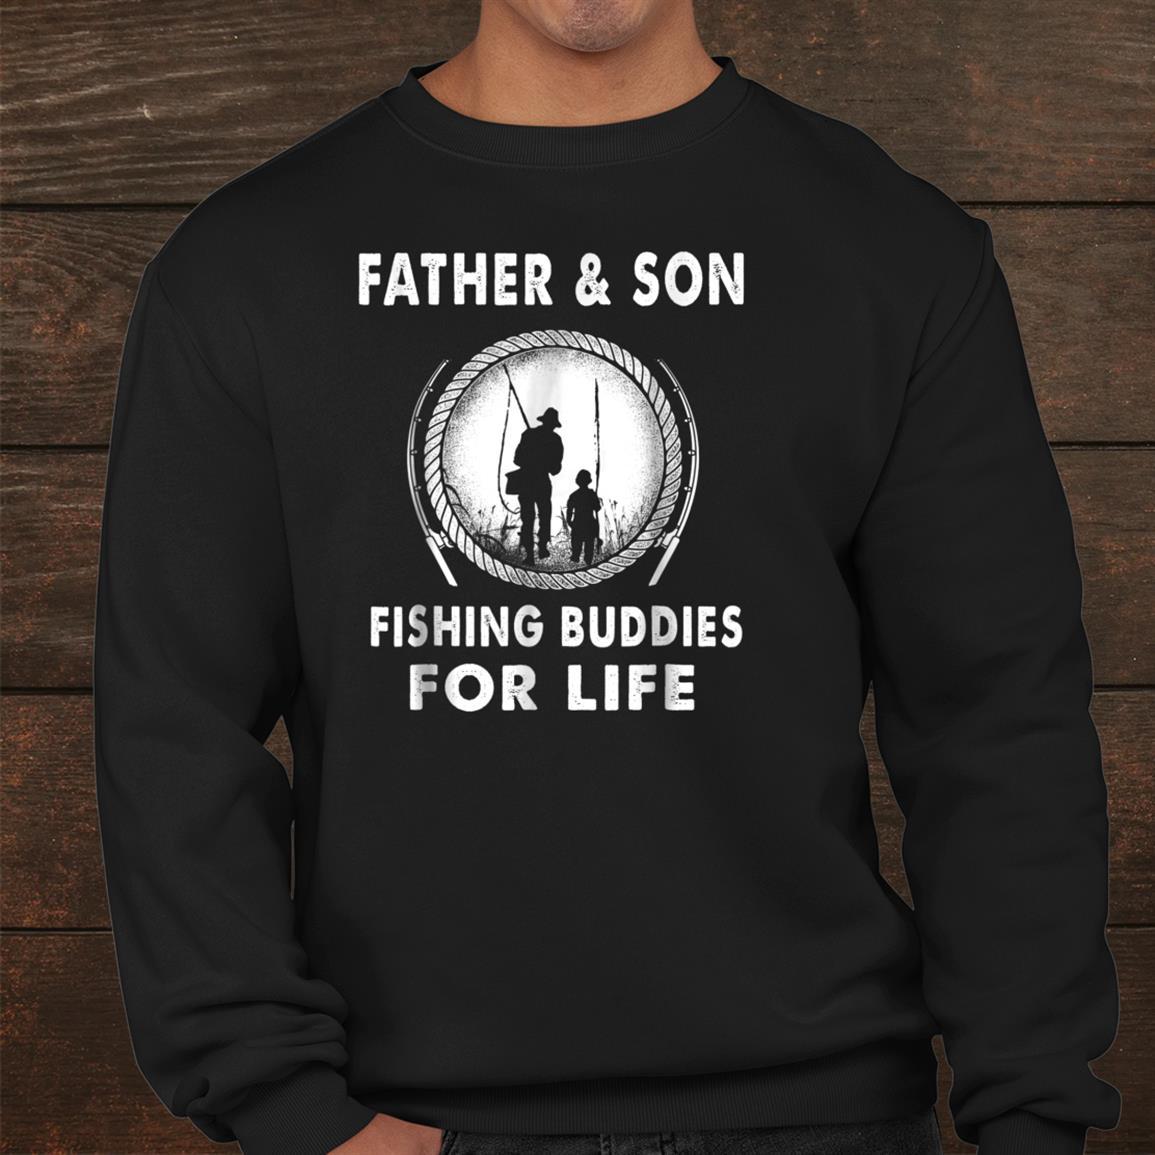 Fatherand & Son Fishing Buddies For Life Funny Fishing Shirt